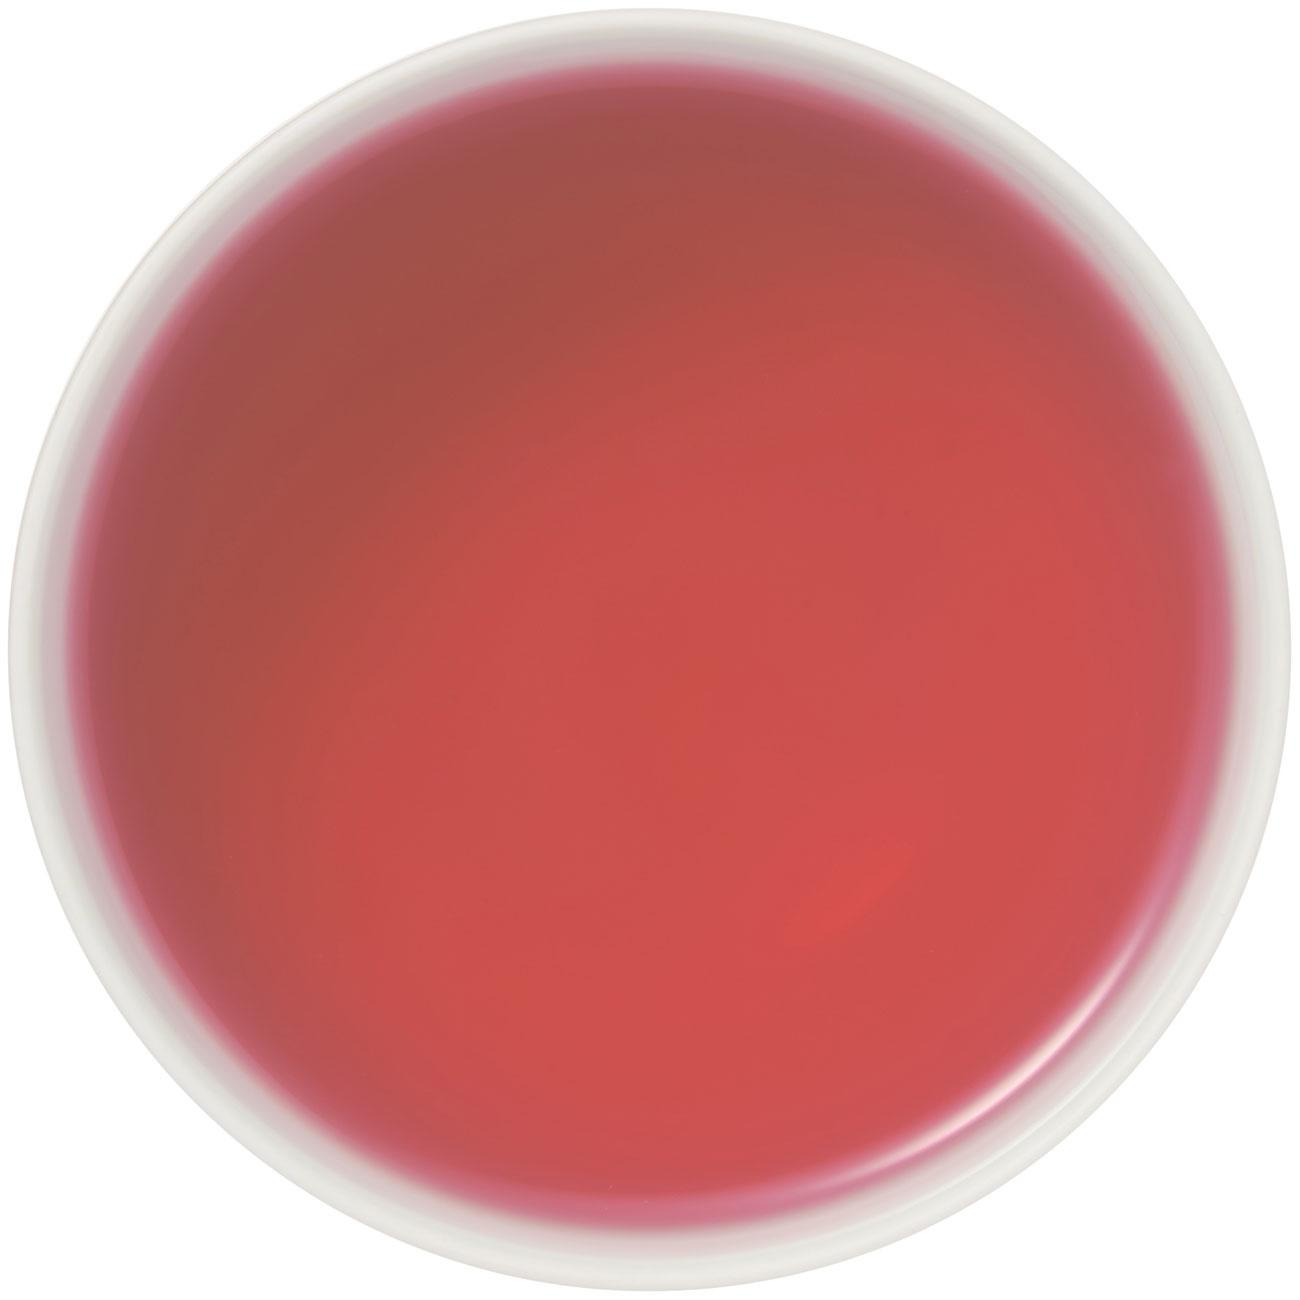 Puur Natuur Grapefruit Lemon-3